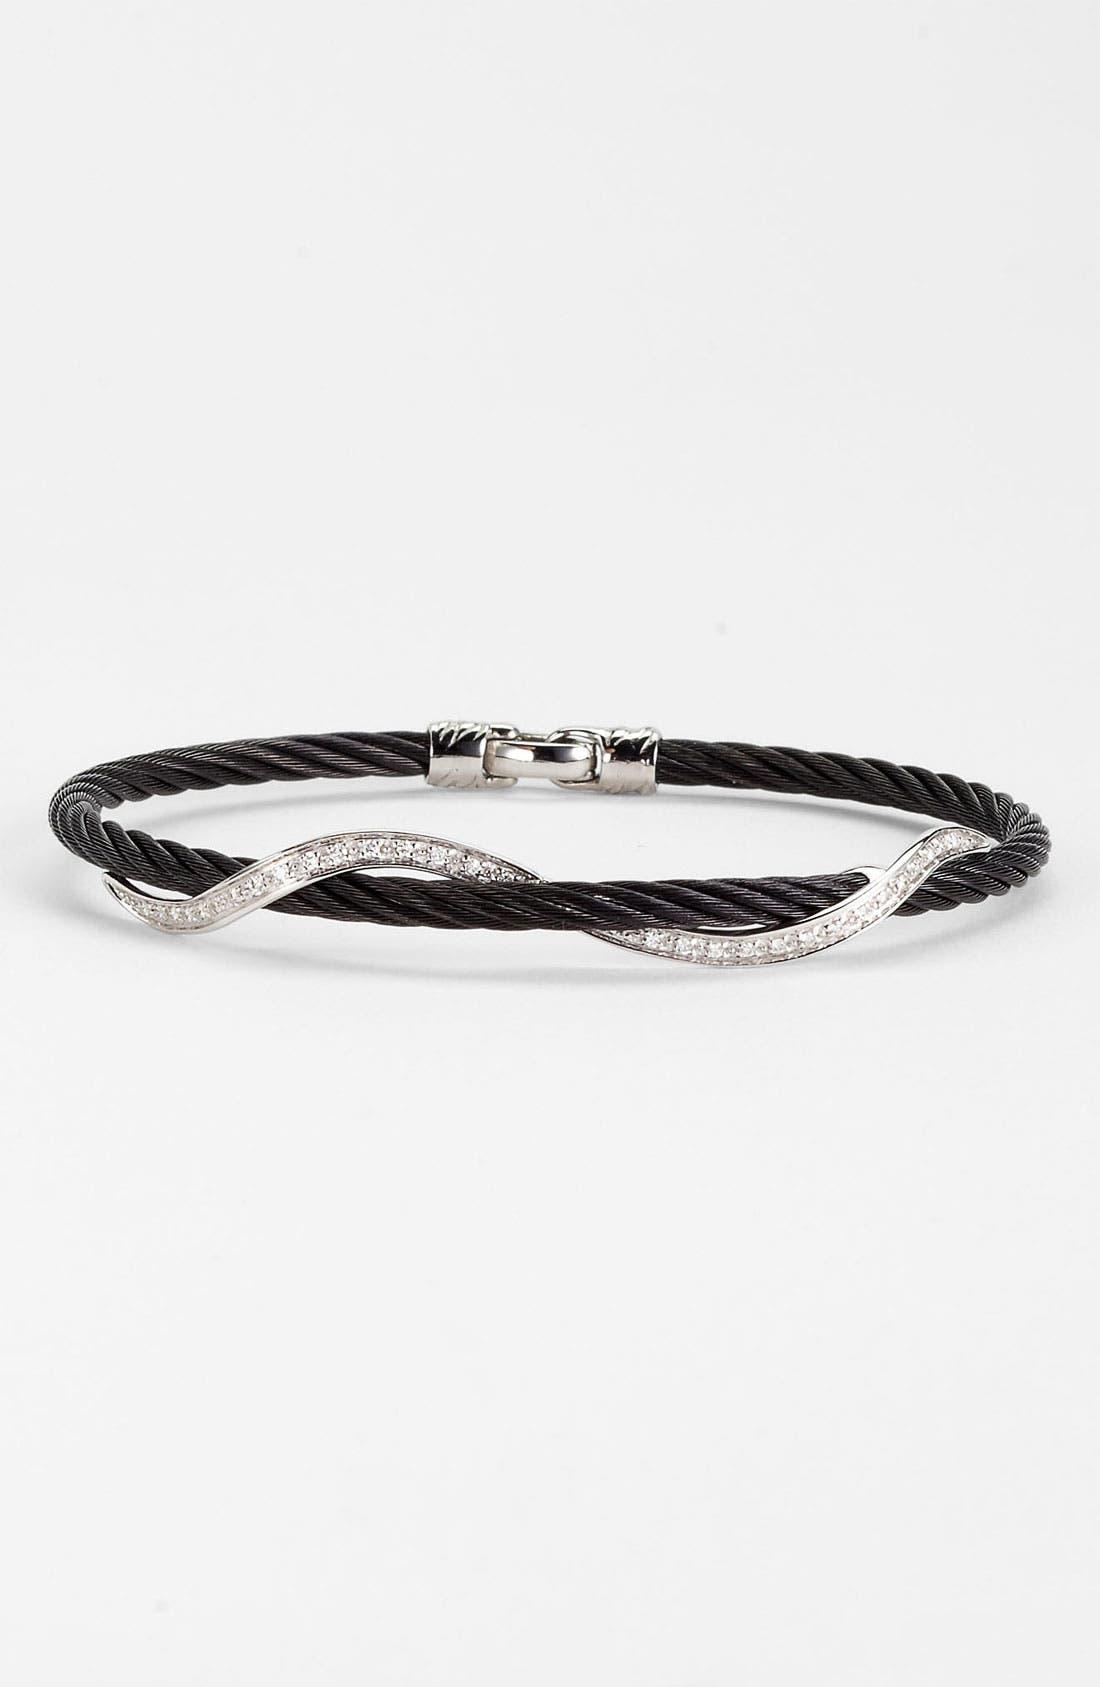 Main Image - ALOR® Diamond Twist Bracelet